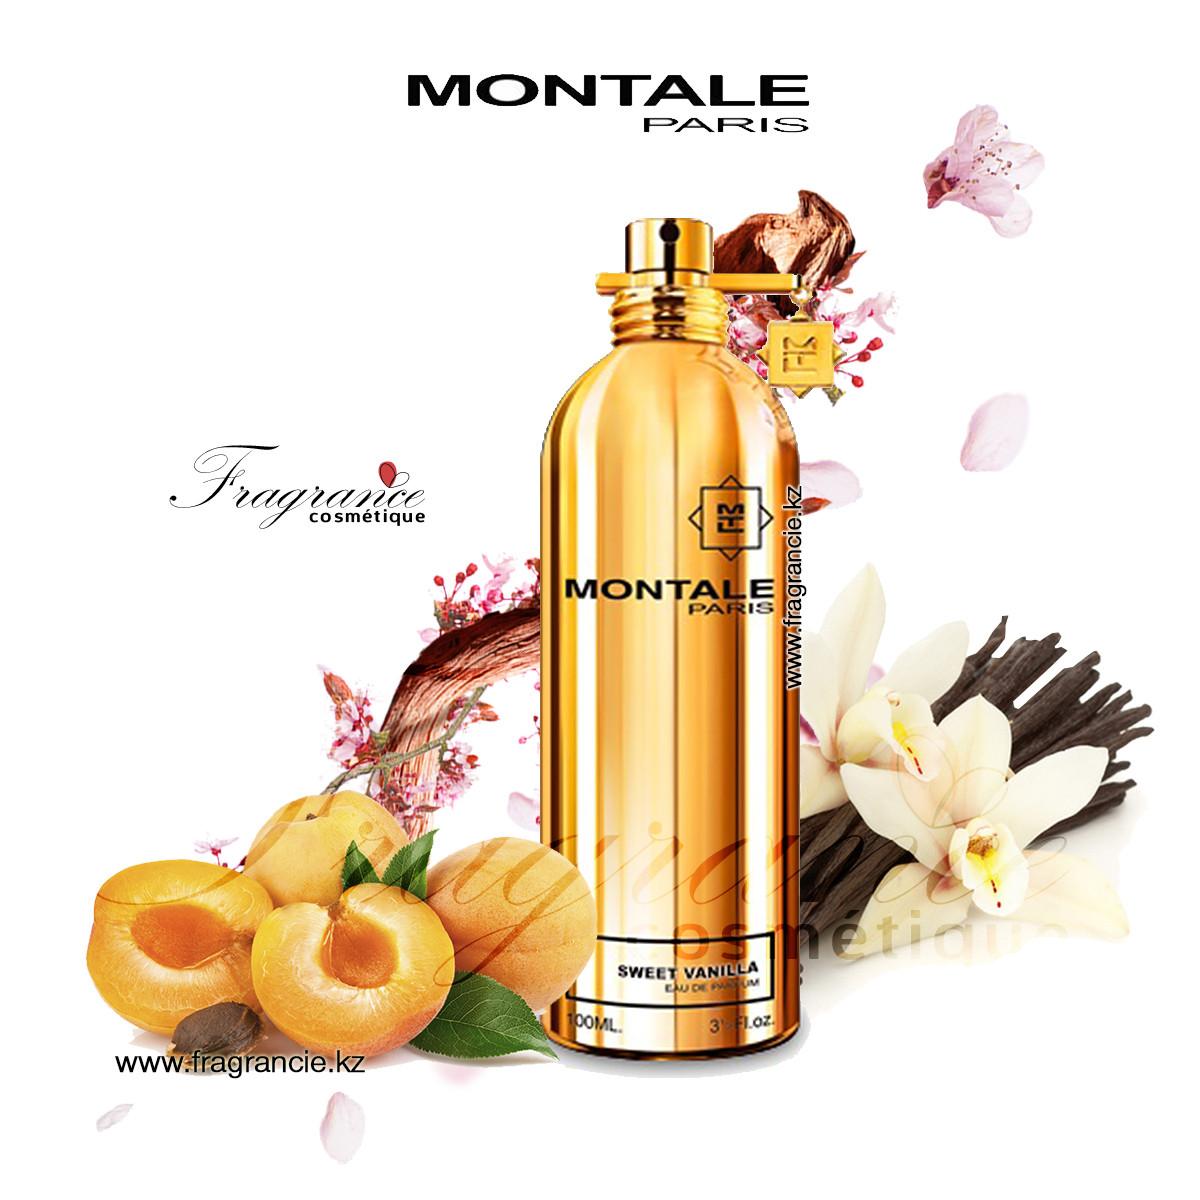 Парфюм Montale Sweet Vanilla 100ml (Оригинал - Франция)